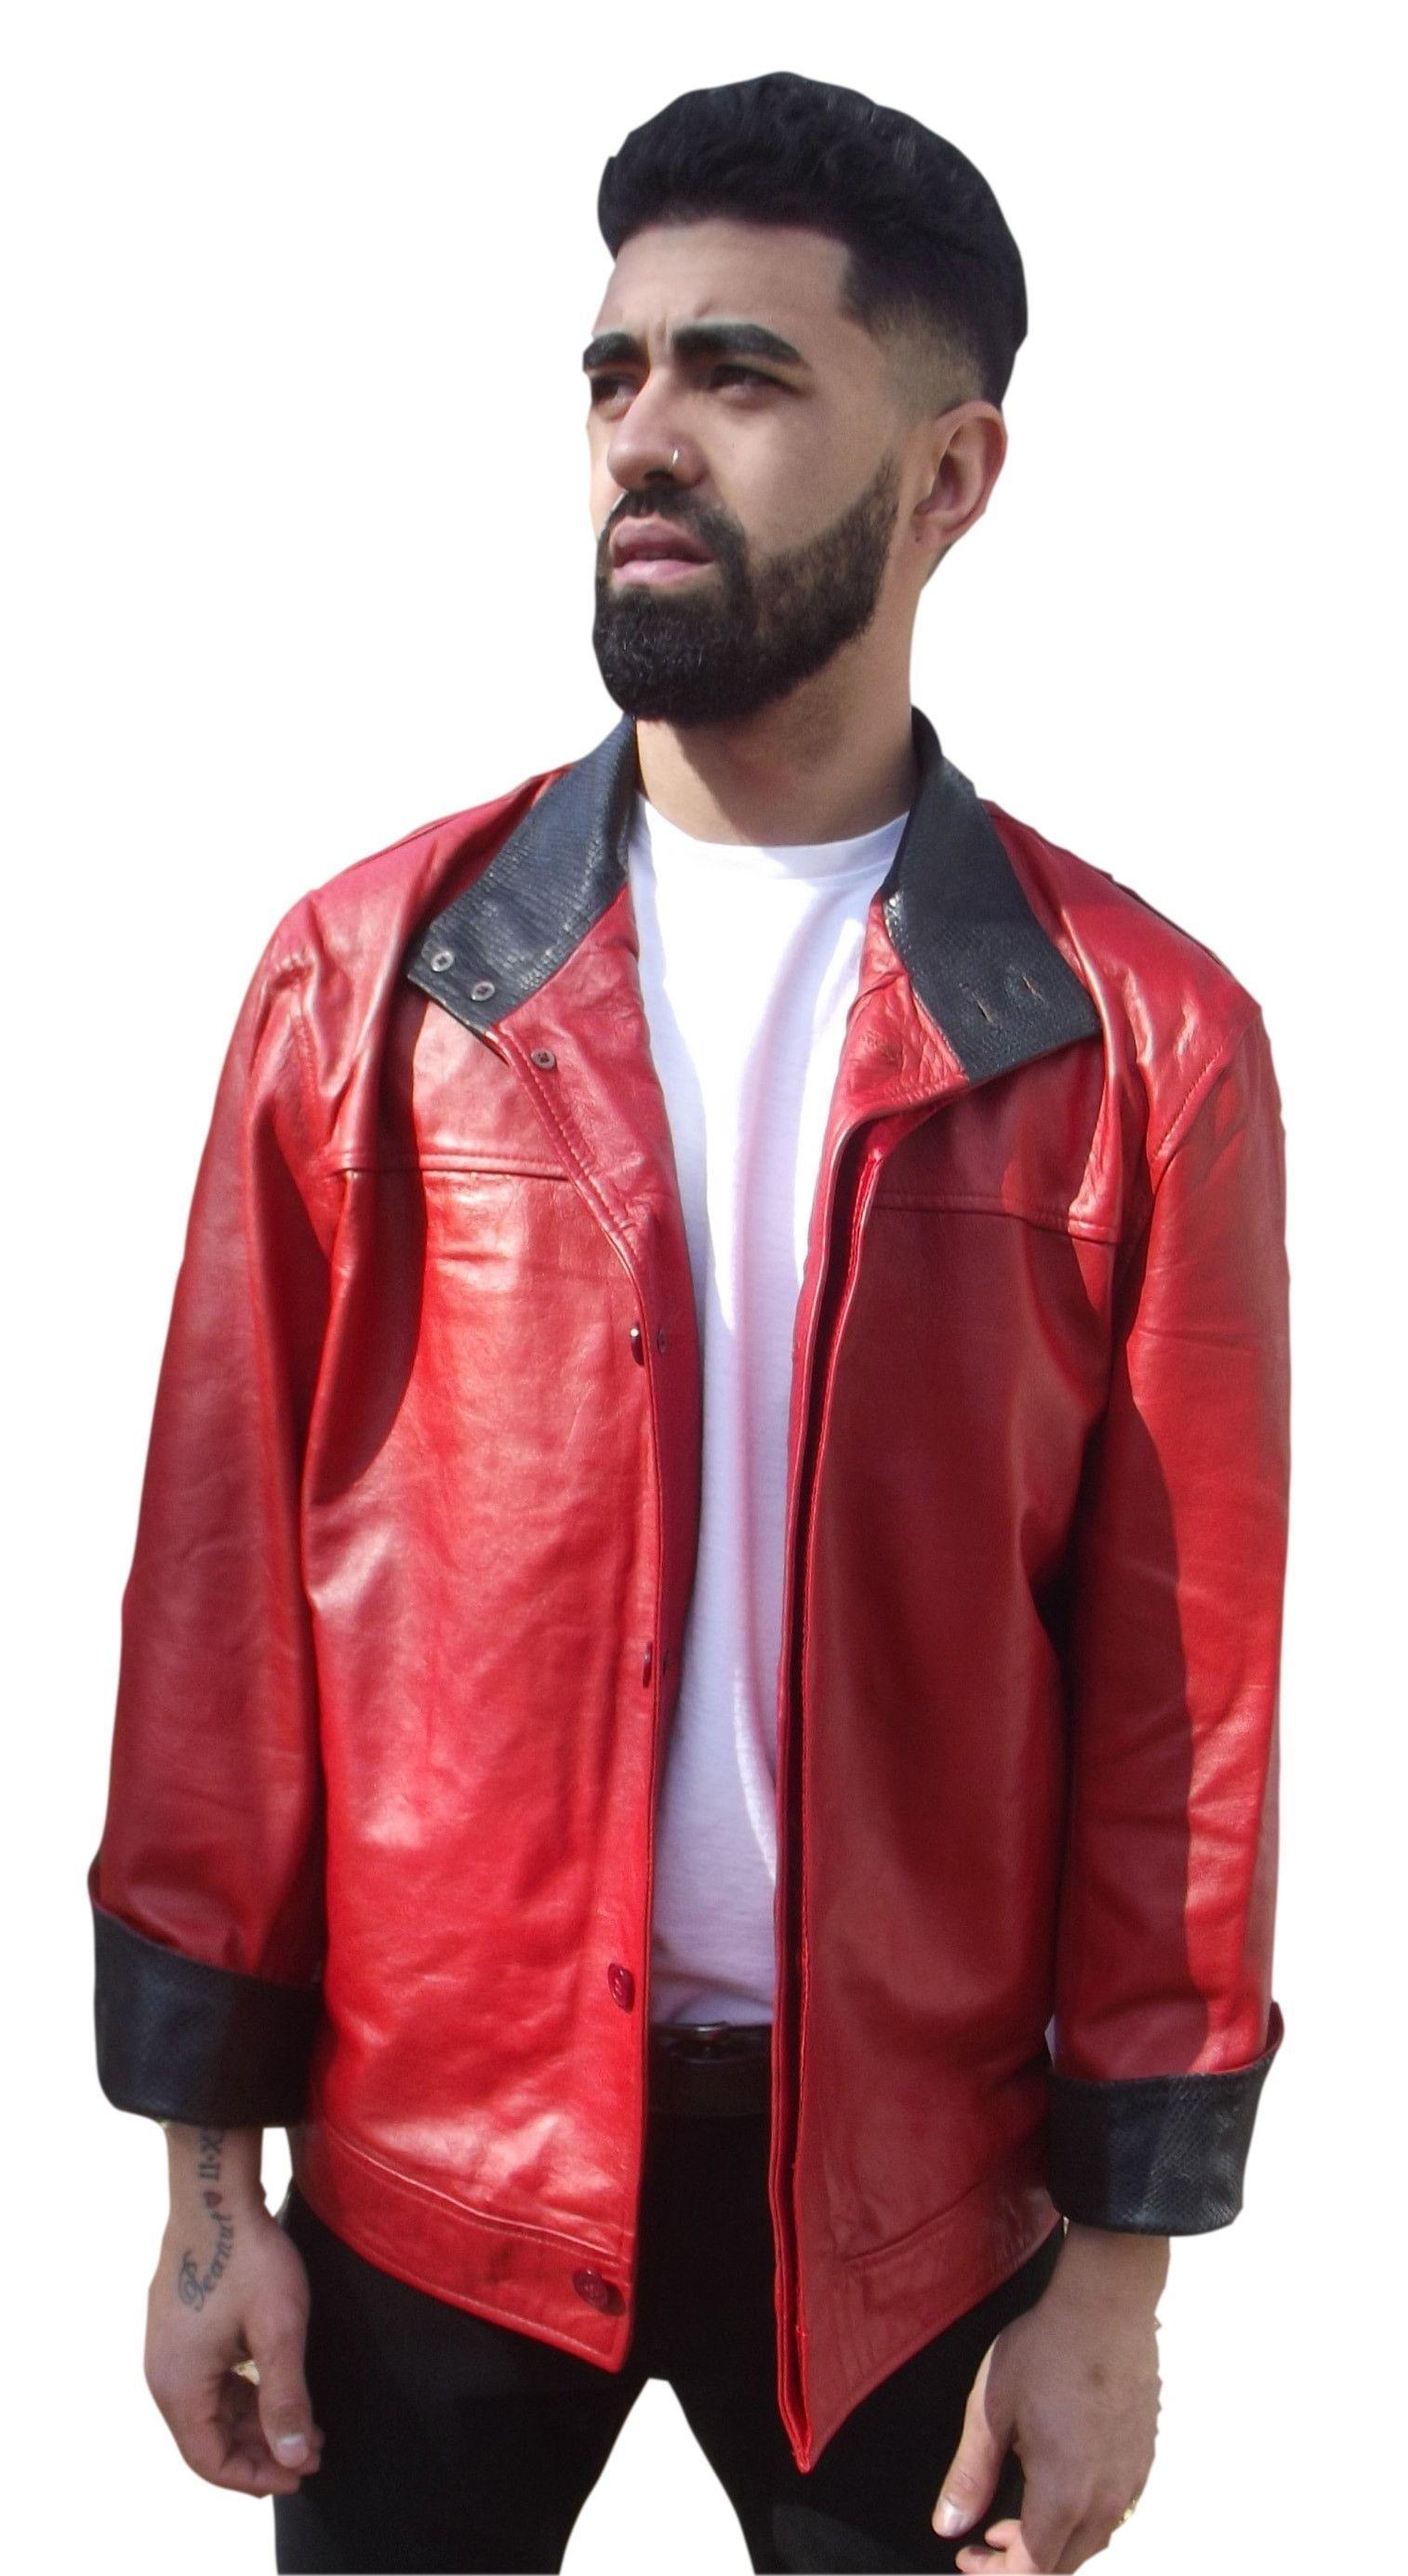 Mens Leather Jacket Red flip cuff Snakeskin embossed inner